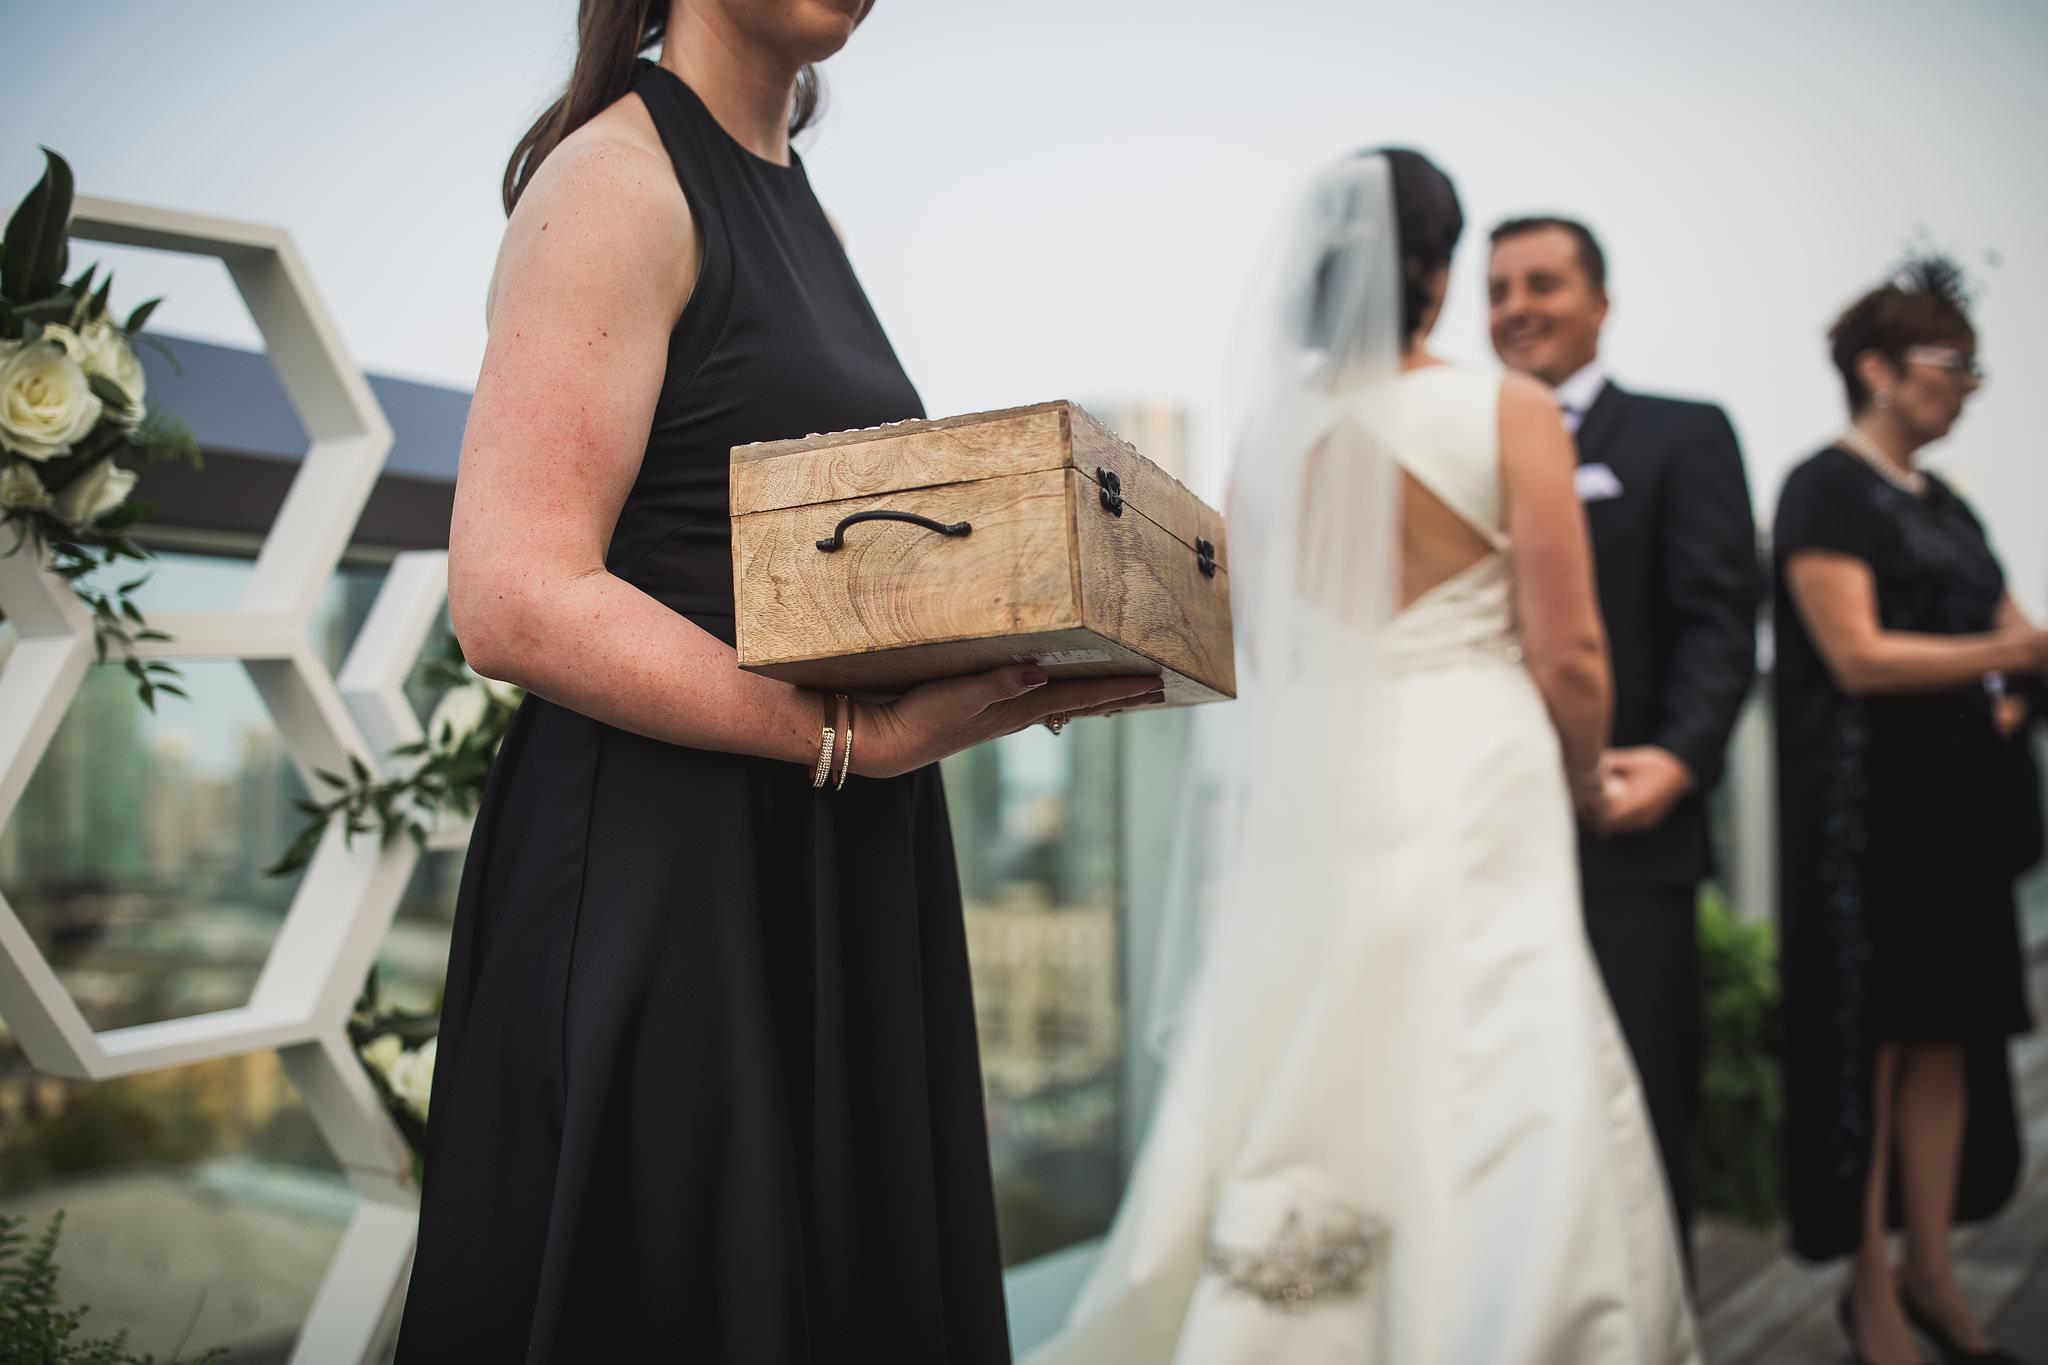 Cristin Rob Thompson Hotel Wedding Photos 539 - Thompson Hotel Wedding Photos